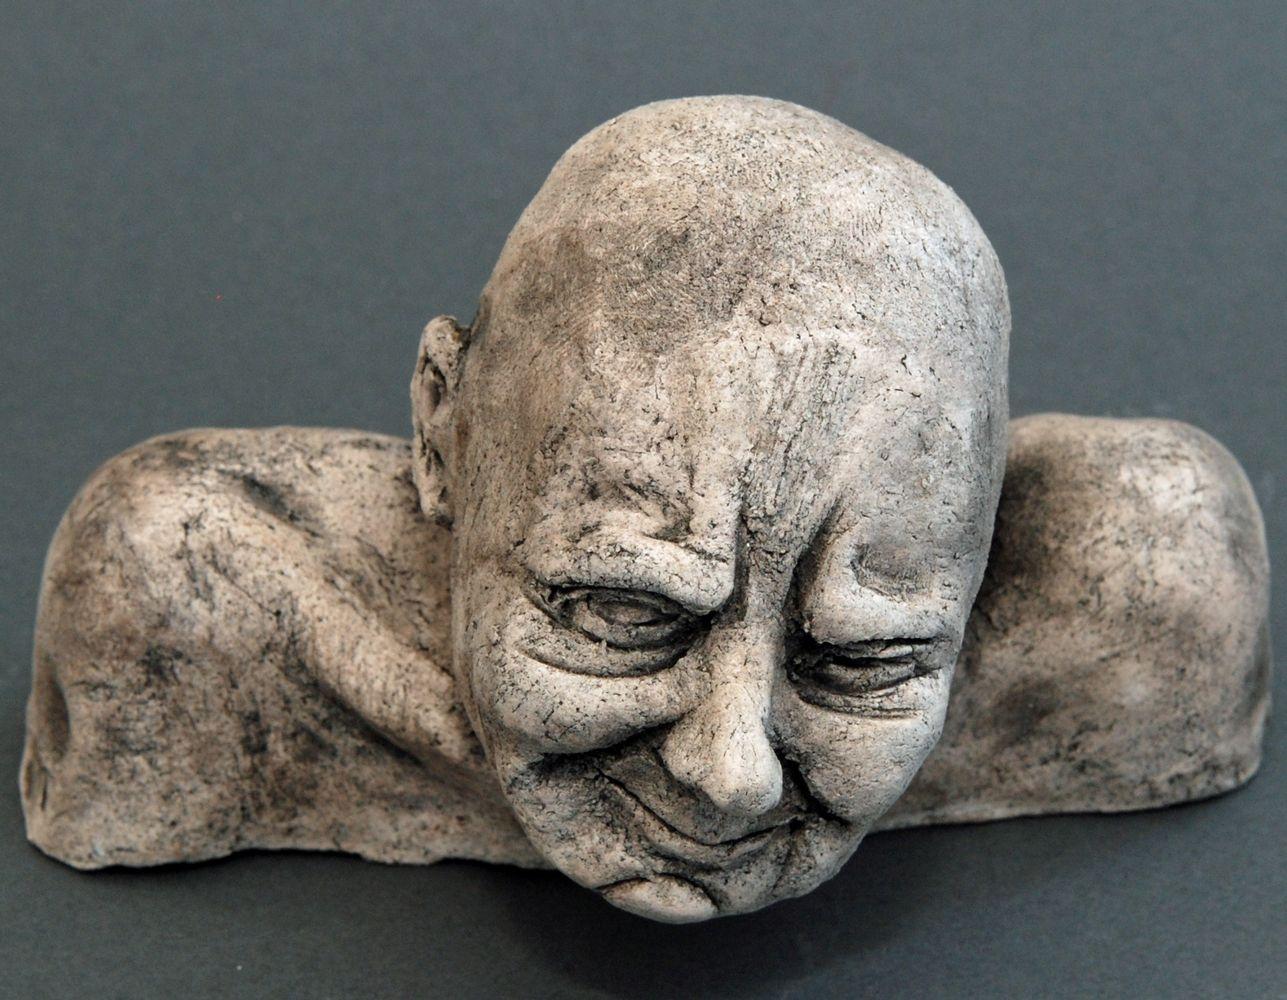 Seelenbilder die Qual, Keramik, Größe: 17 x 3,5 x 14 cm